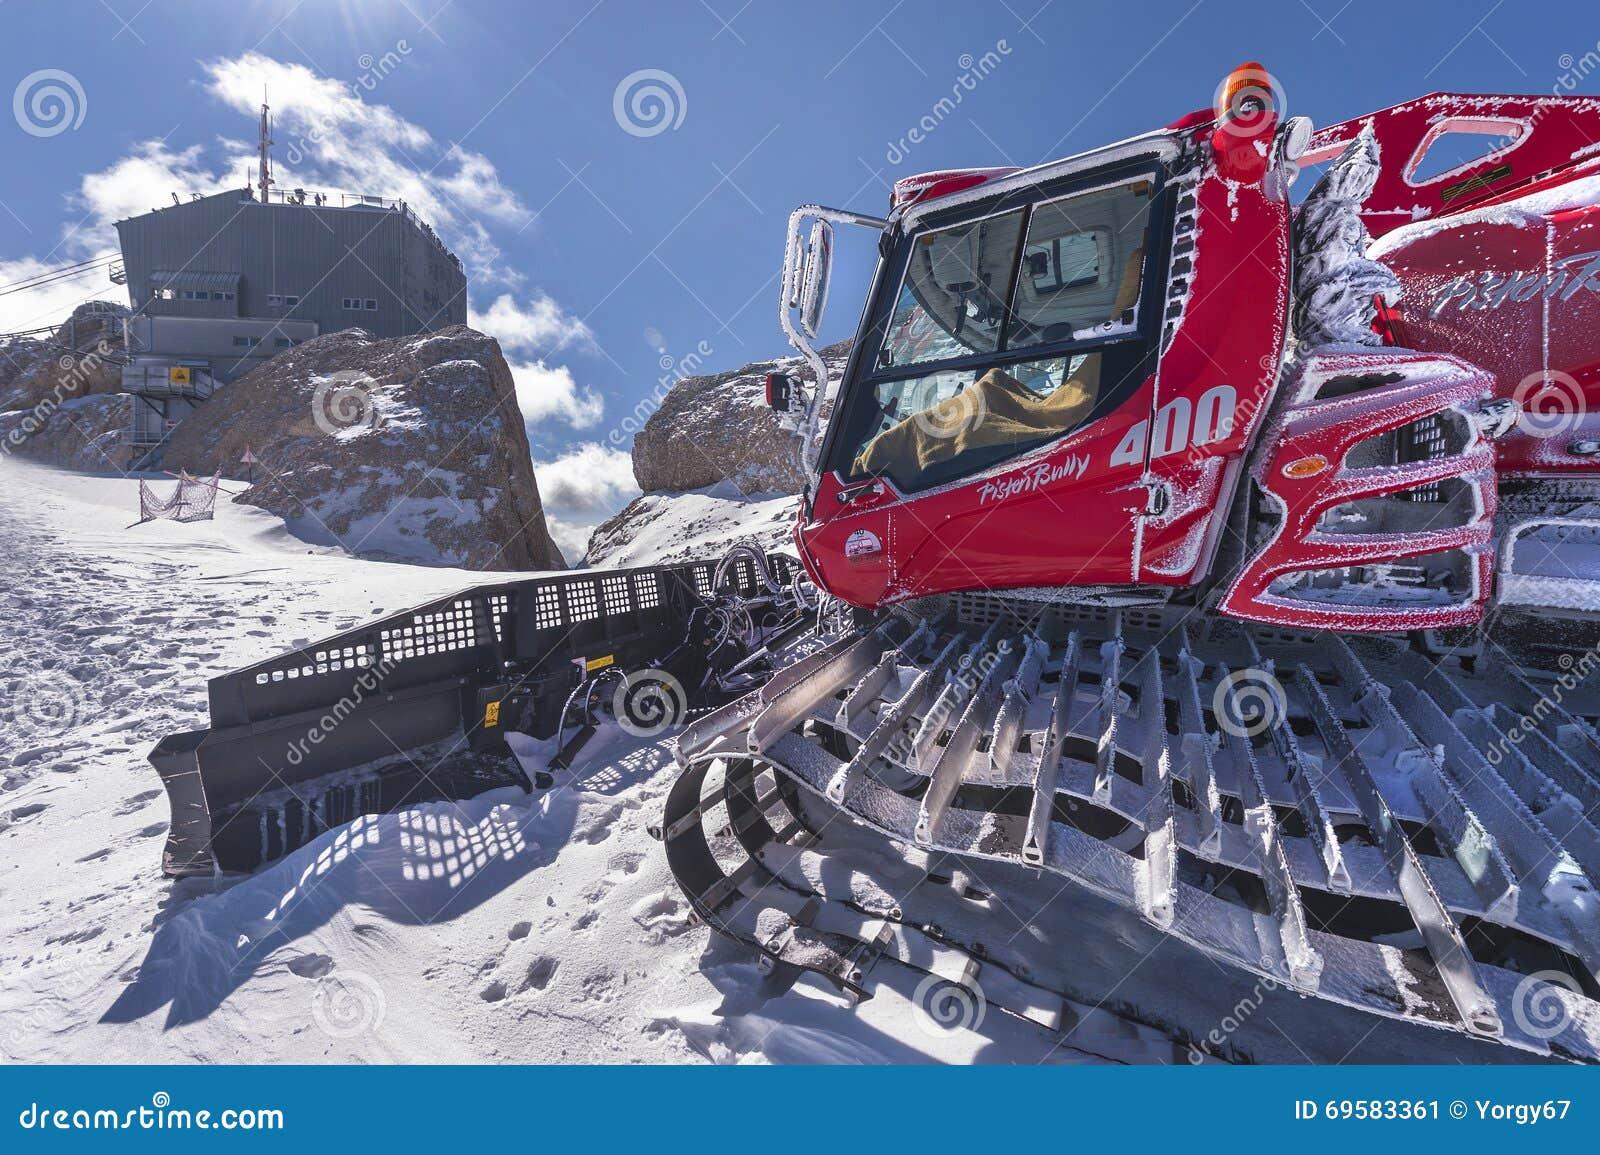 snow removing machine